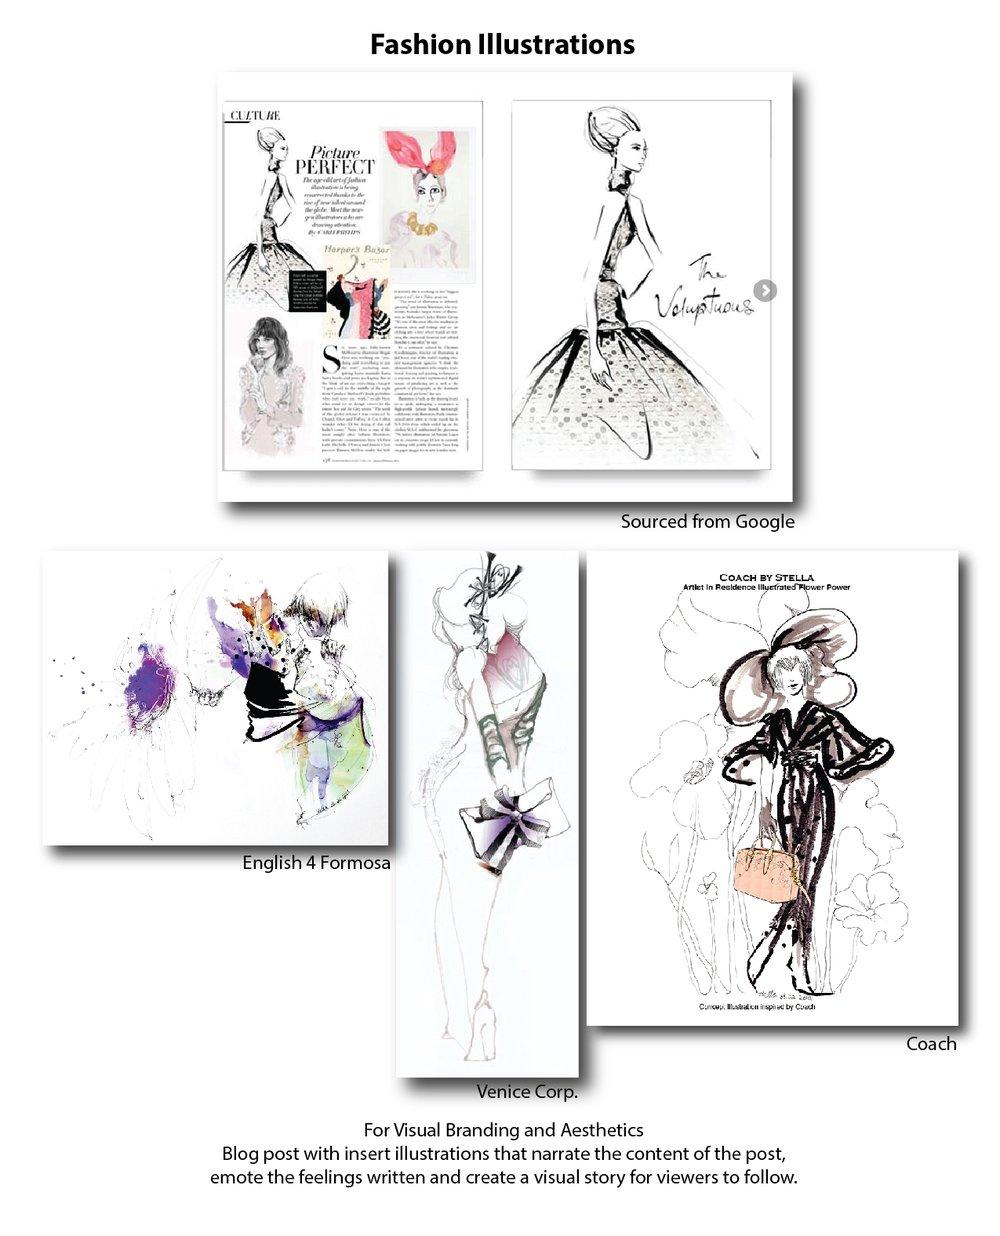 Fashion Illustrations by ModaRévisé®